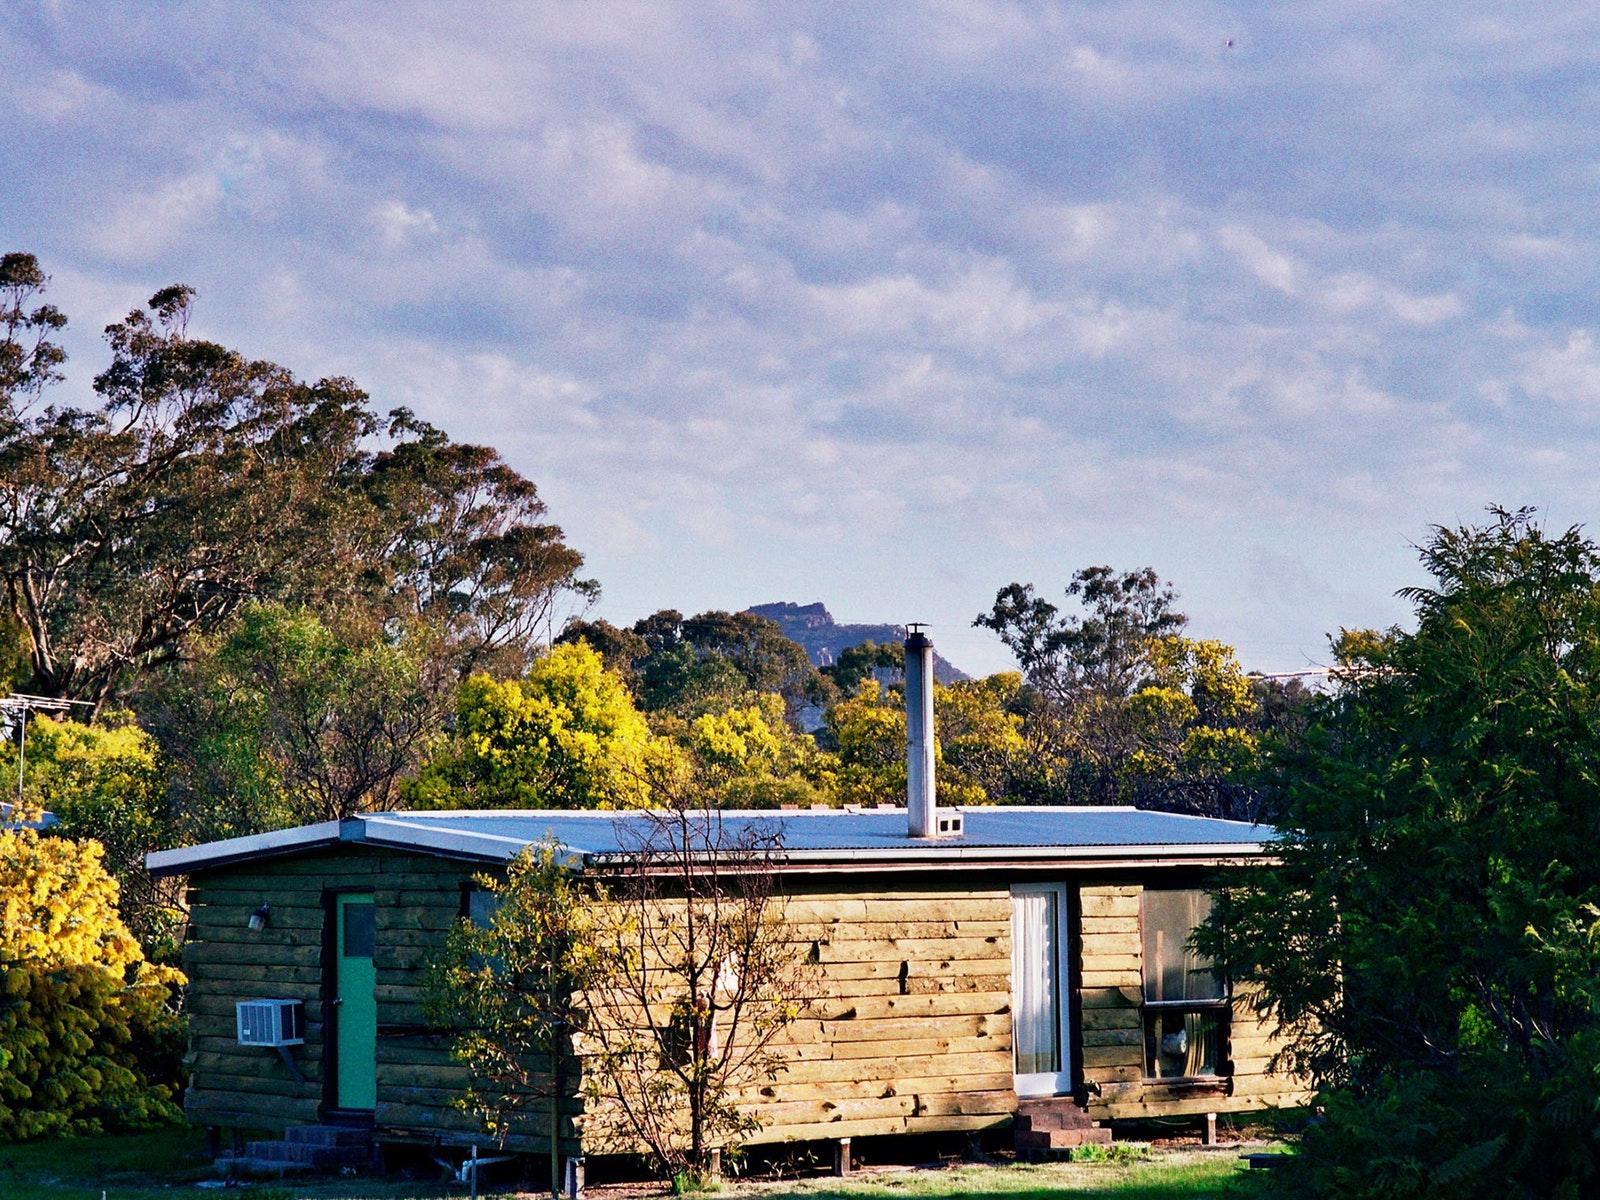 accommodation victoria australia. Black Bedroom Furniture Sets. Home Design Ideas